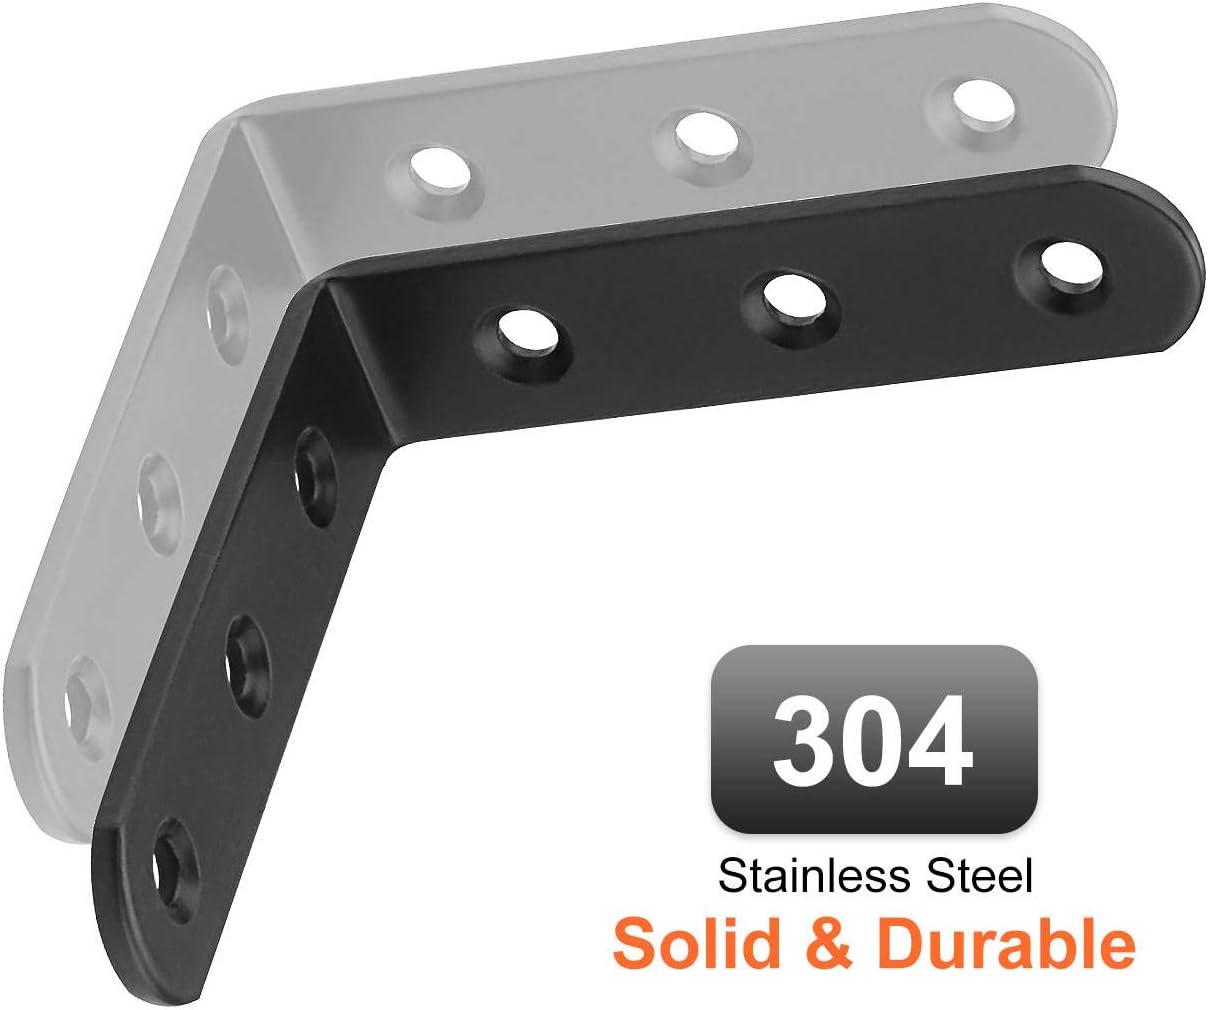 Starvast Lot de 16 /équerres dangle en acier inoxydable 90 degr/és 100 mm x 100 mm x 3 mm en forme de L Noir